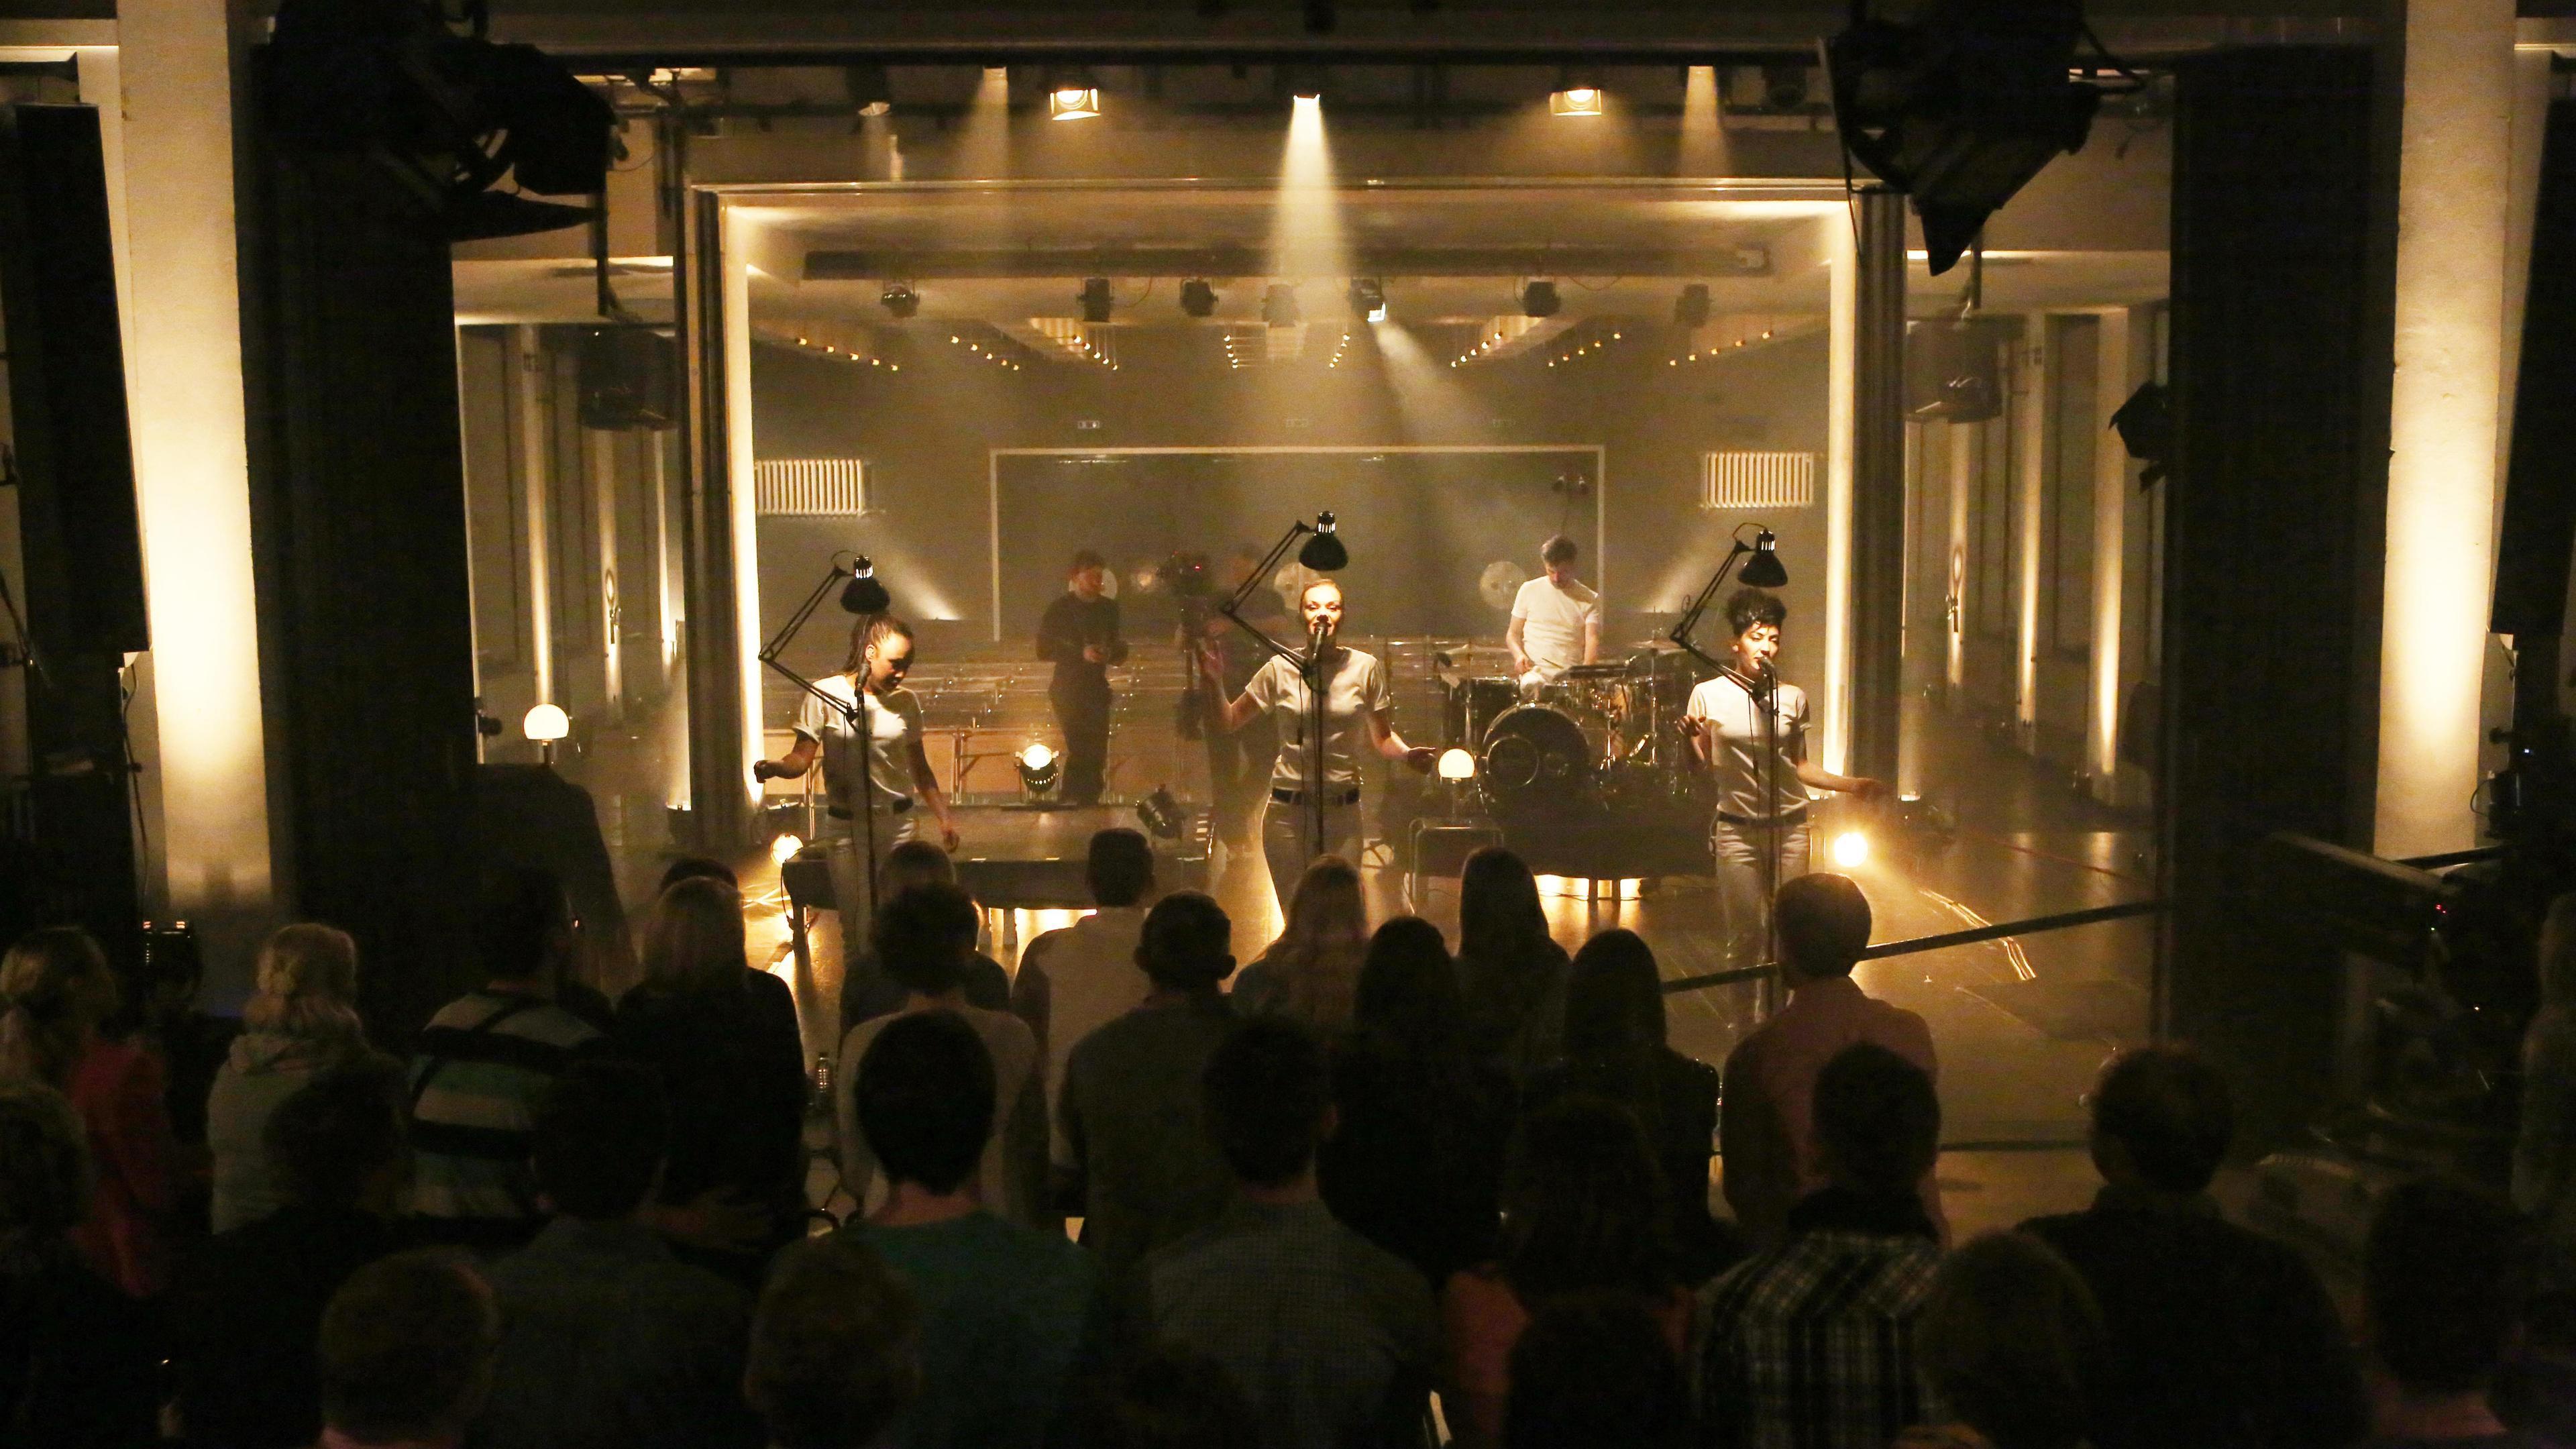 Laing Live Musik Bei Zdf Bauhaus Zdfmediathek